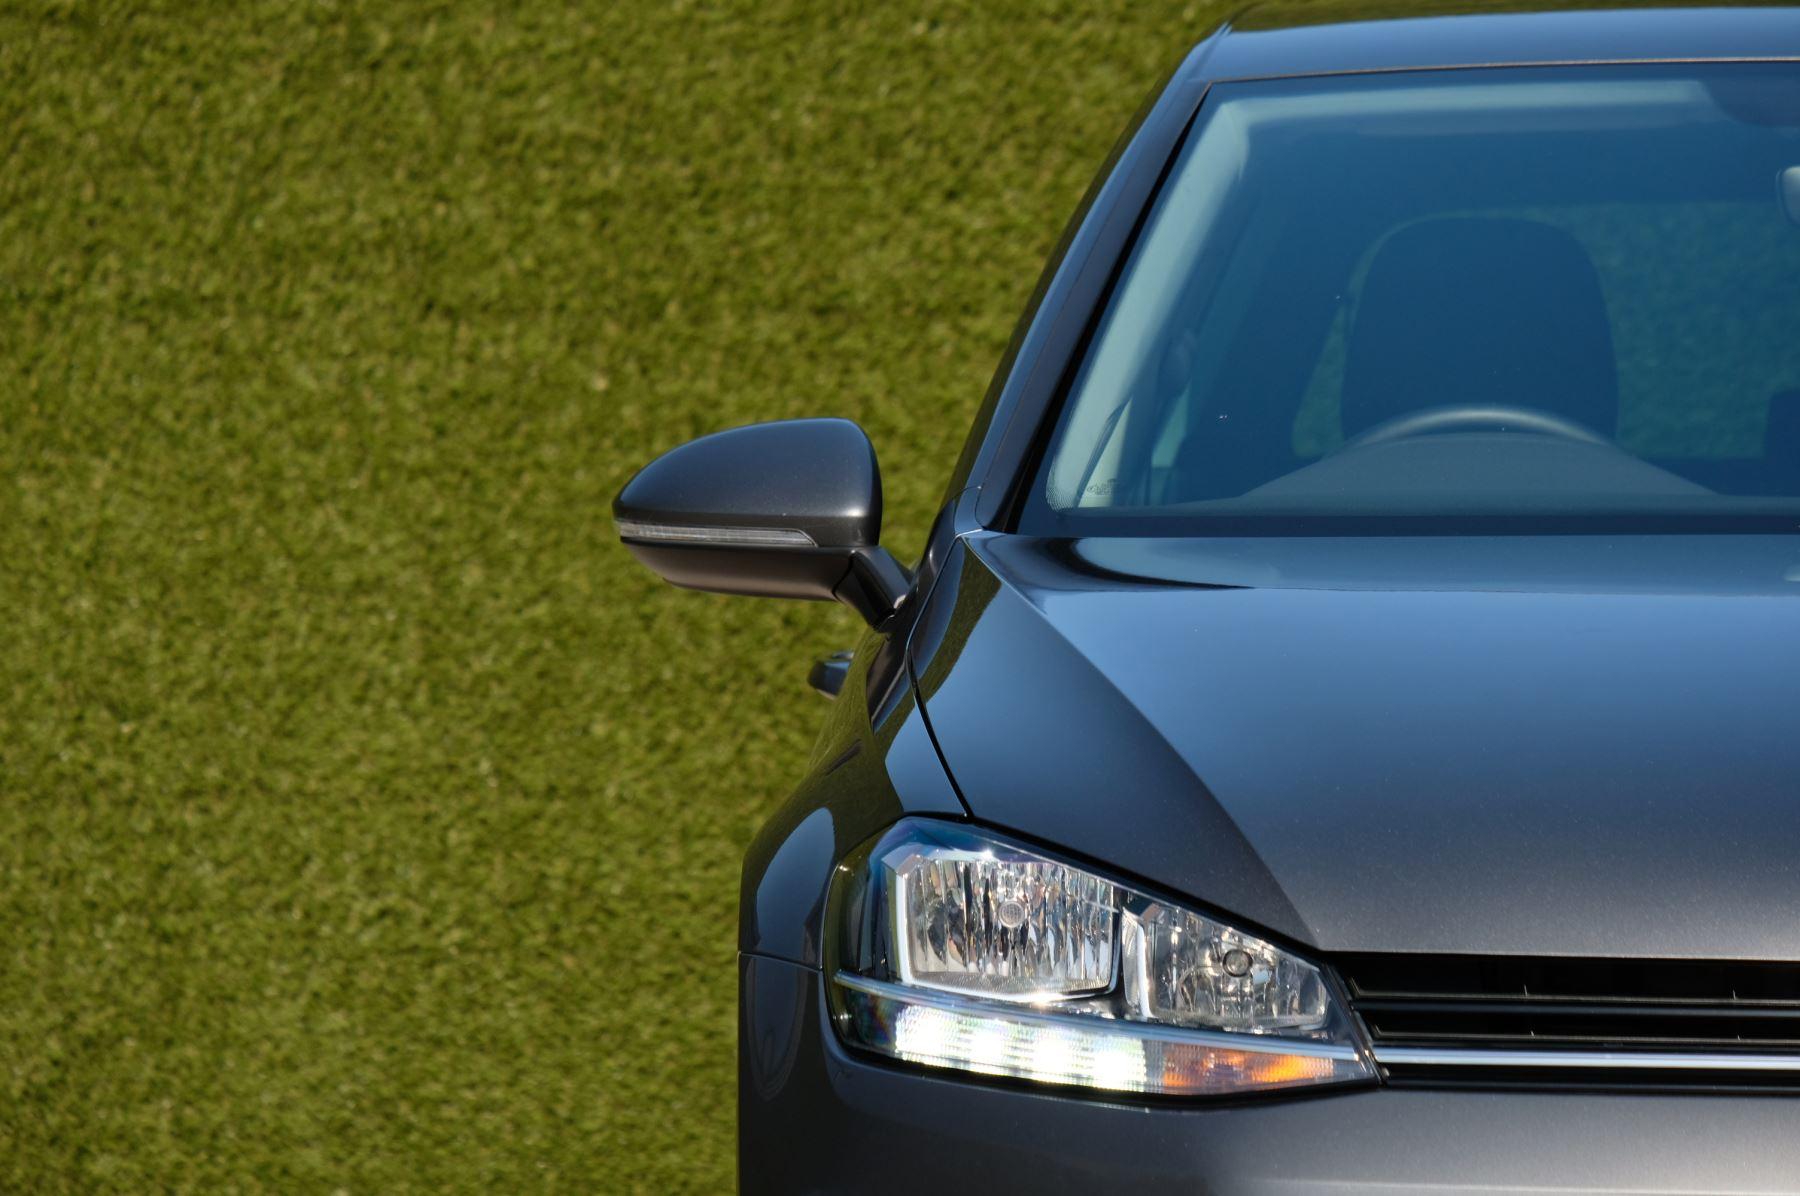 Volkswagen Golf 1.5 TSI EVO 150hp Match 5 Door DSG Auto with A/Con, Sat Nav, Alloys & Adaptive Cruise  image 5